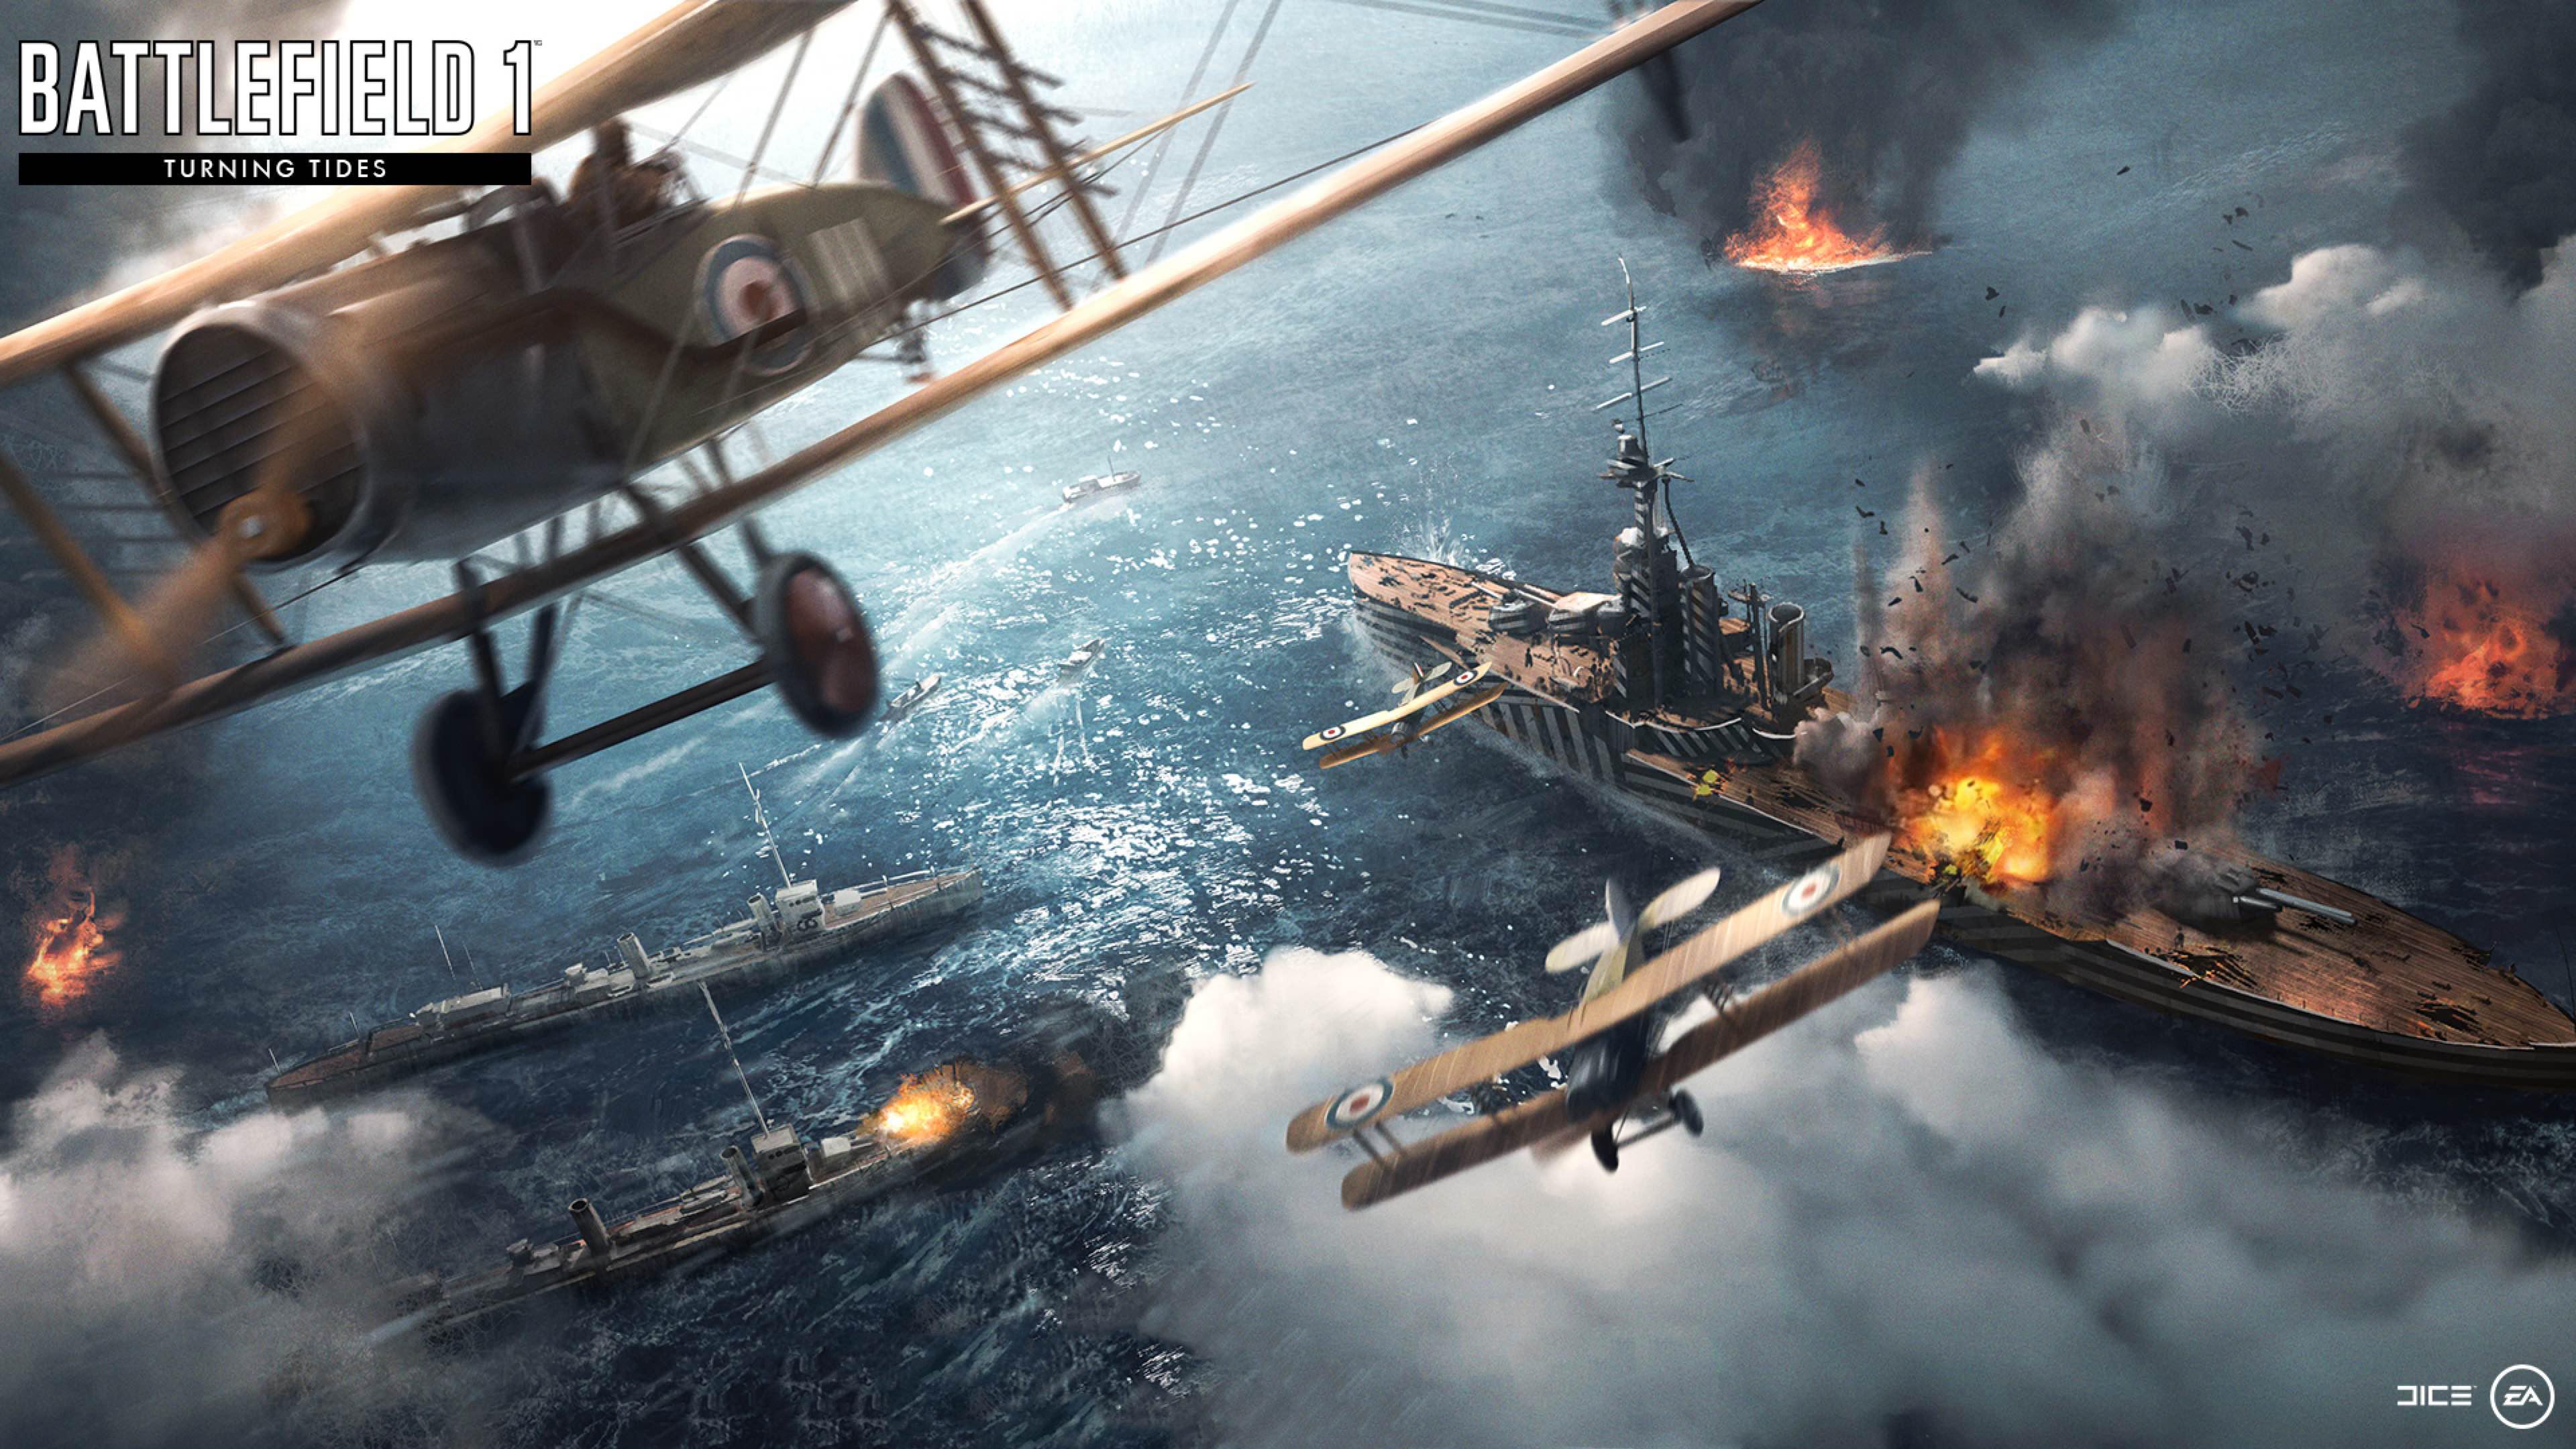 Favoris Battlefield 1 Turning Tides 2018, HD Games, 4k Wallpapers, Images  GO82